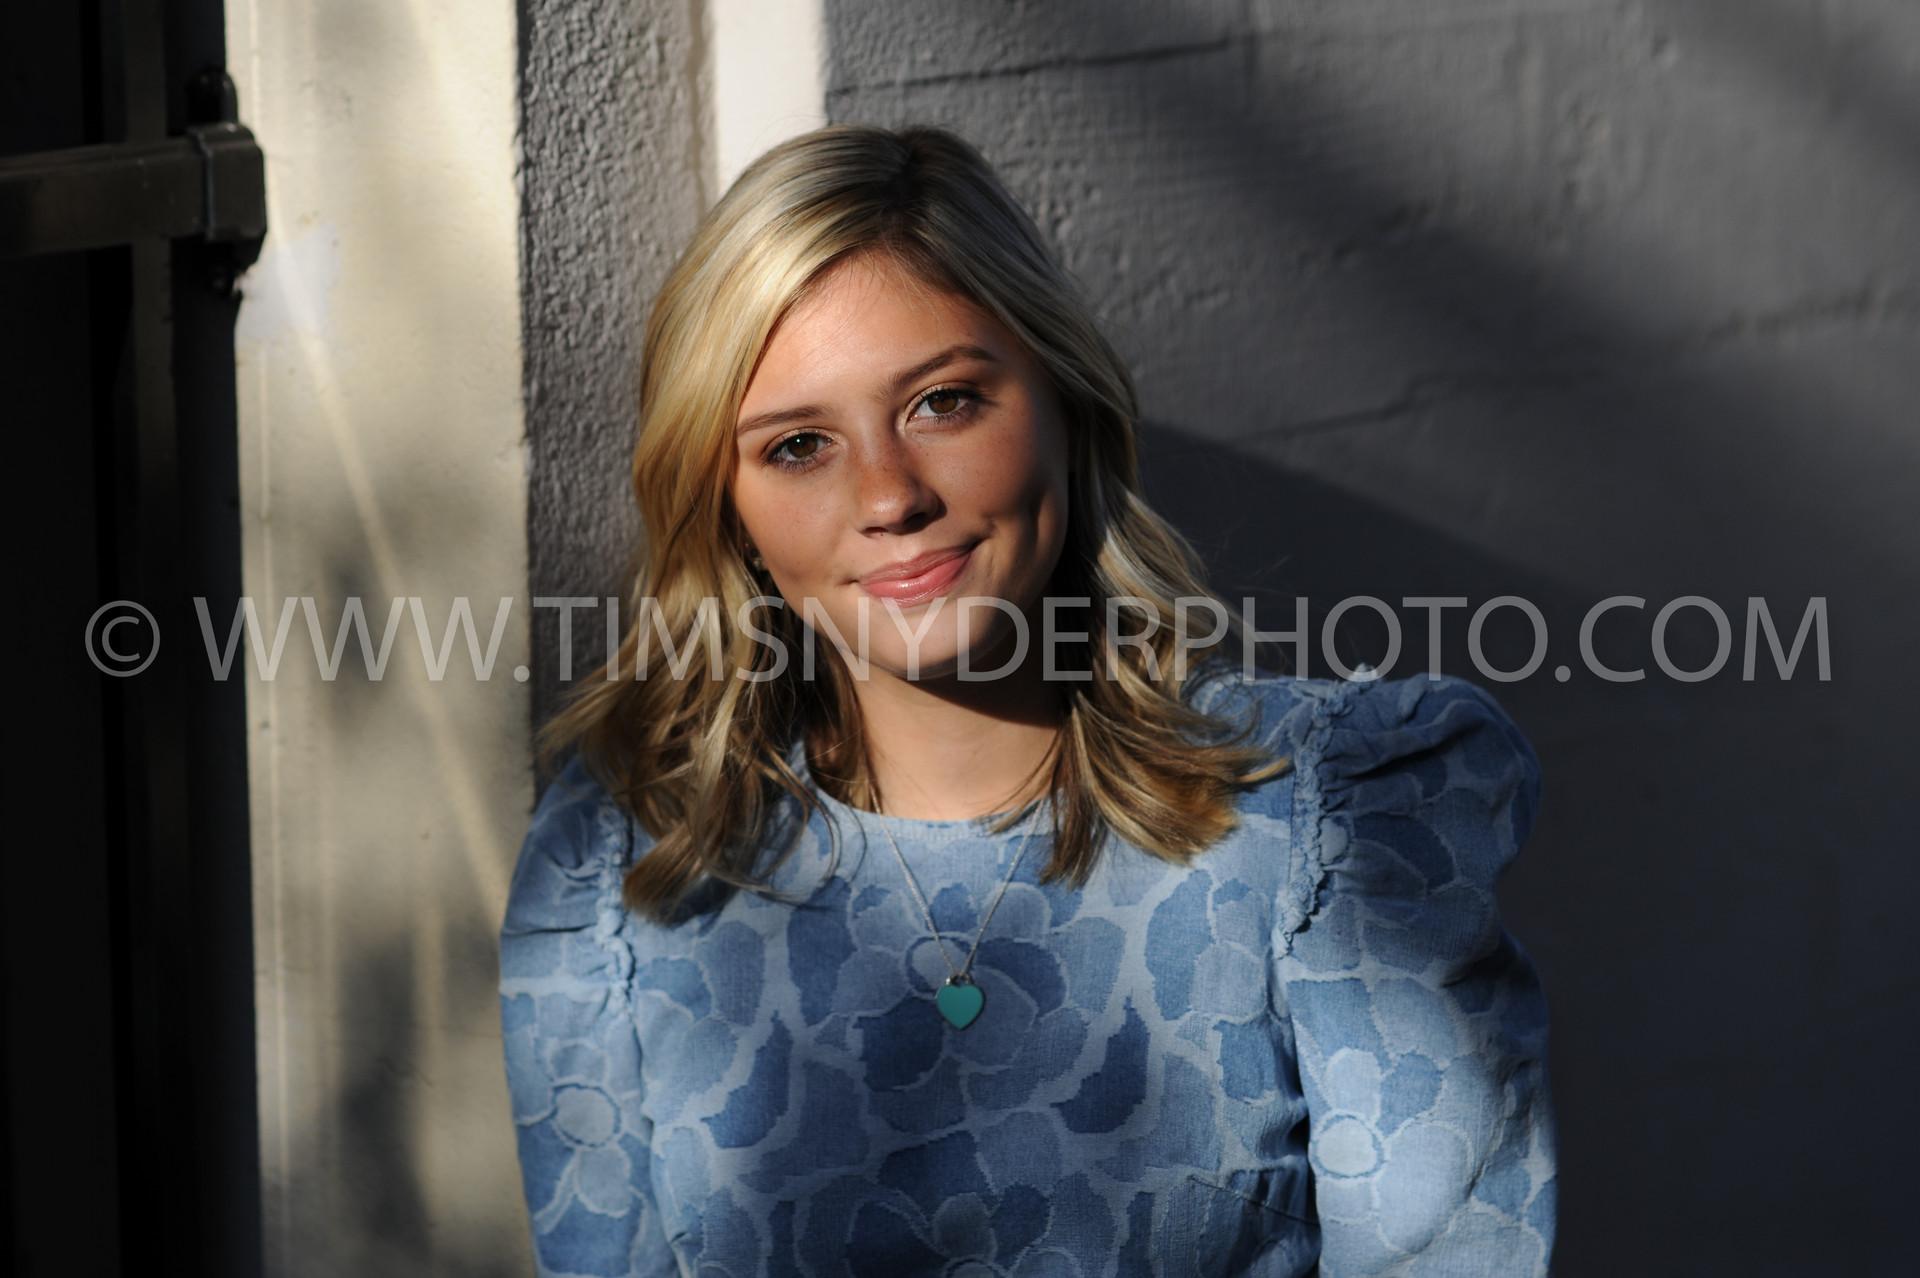 Olivia.Proof.TIMSNYDERPHOTO2019-12.jpg